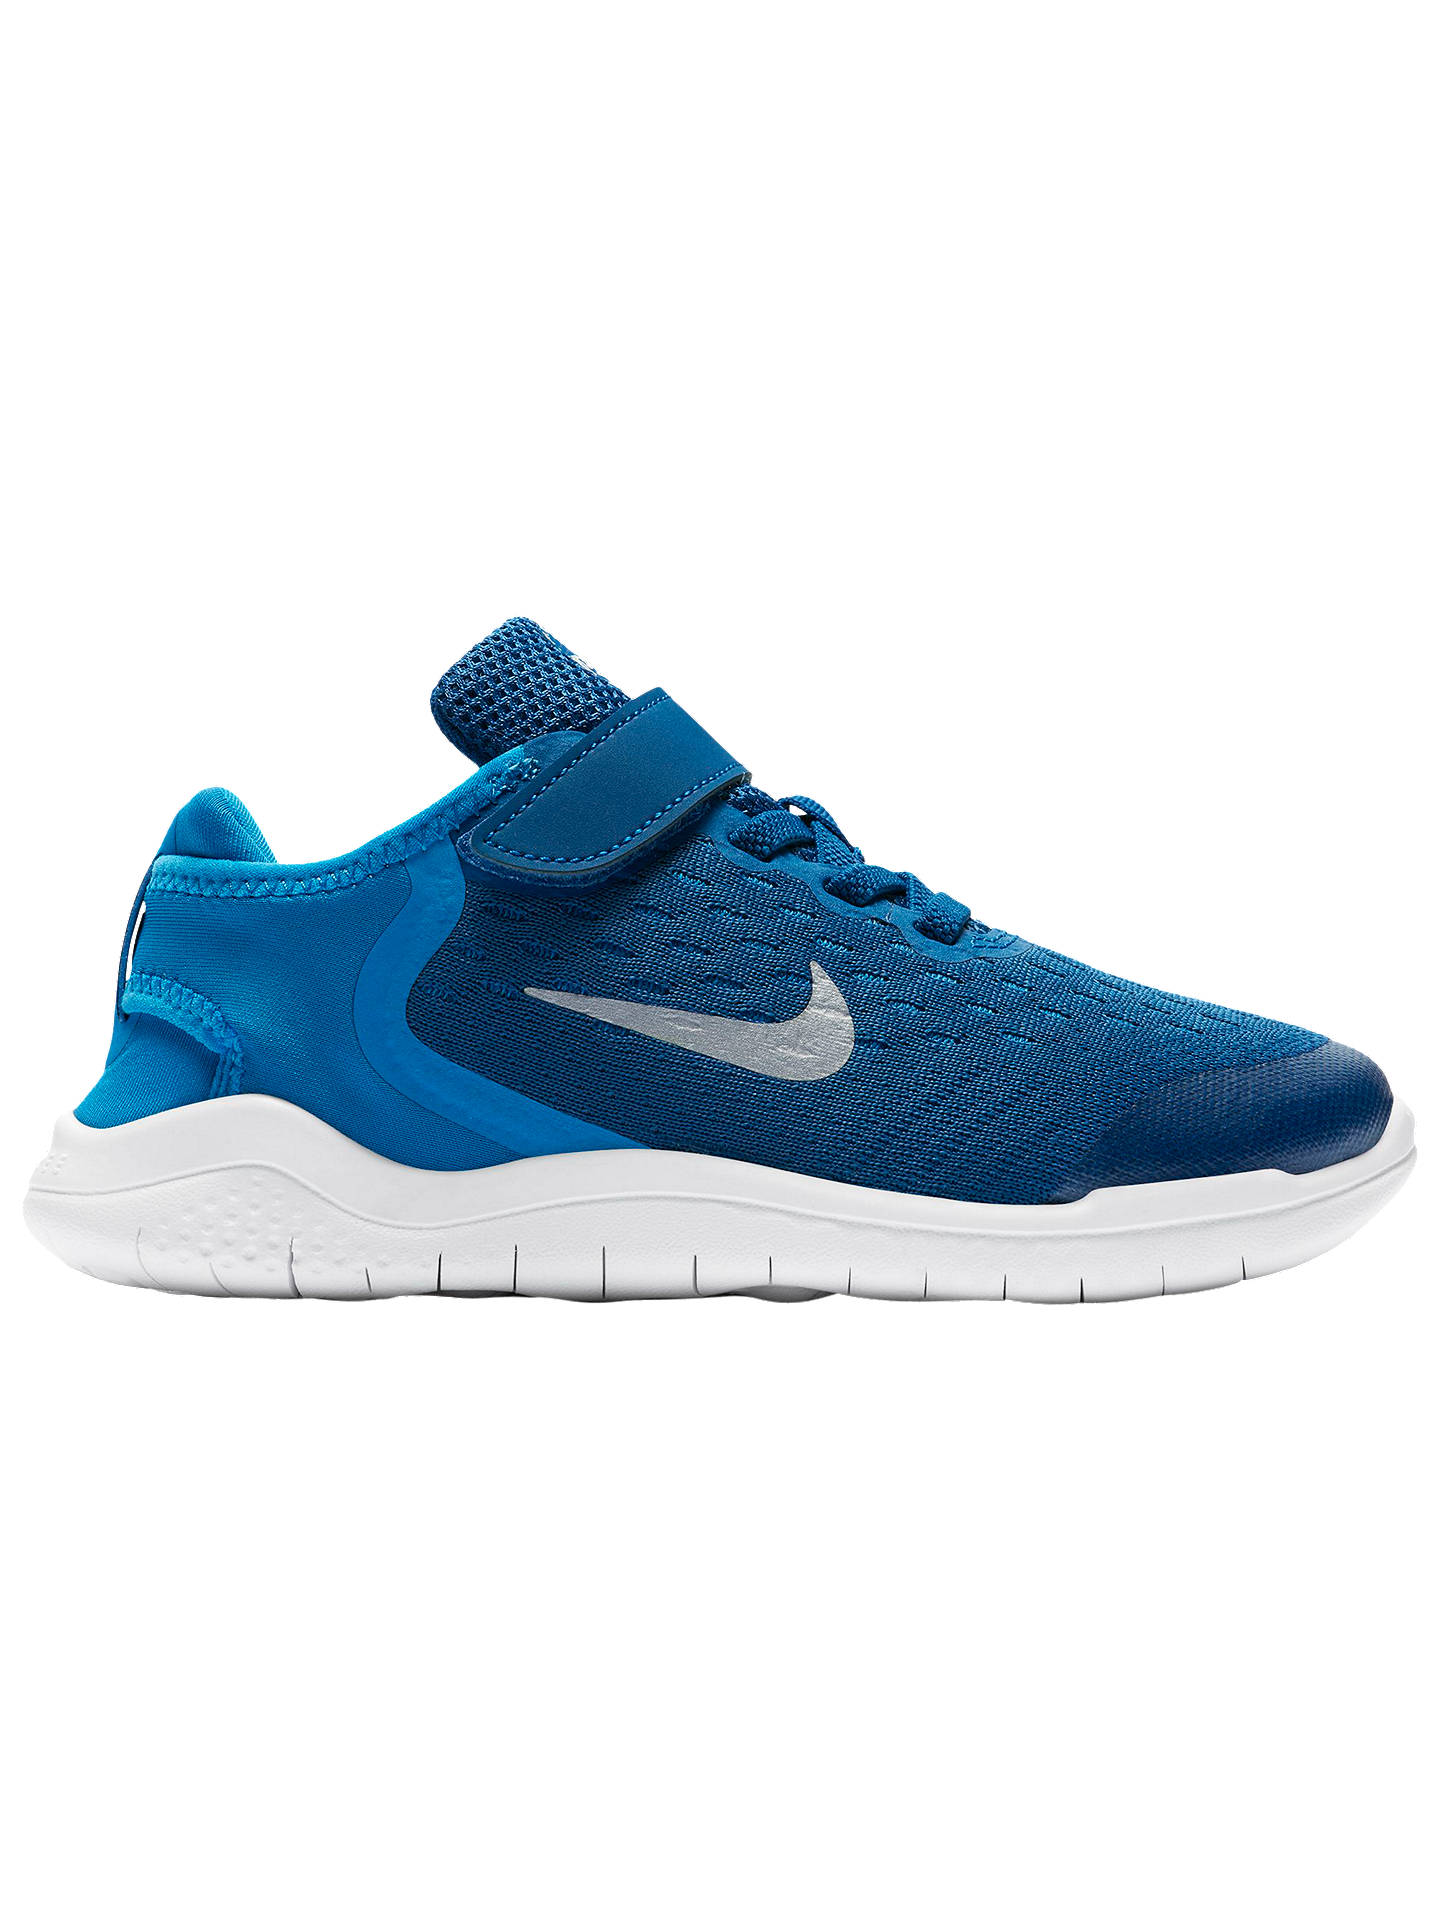 new style 0e958 d58f8 Buy Nike Children s Free RN 2018 Riptape Trainers, Blue, 10 Jnr Online at  johnlewis ...